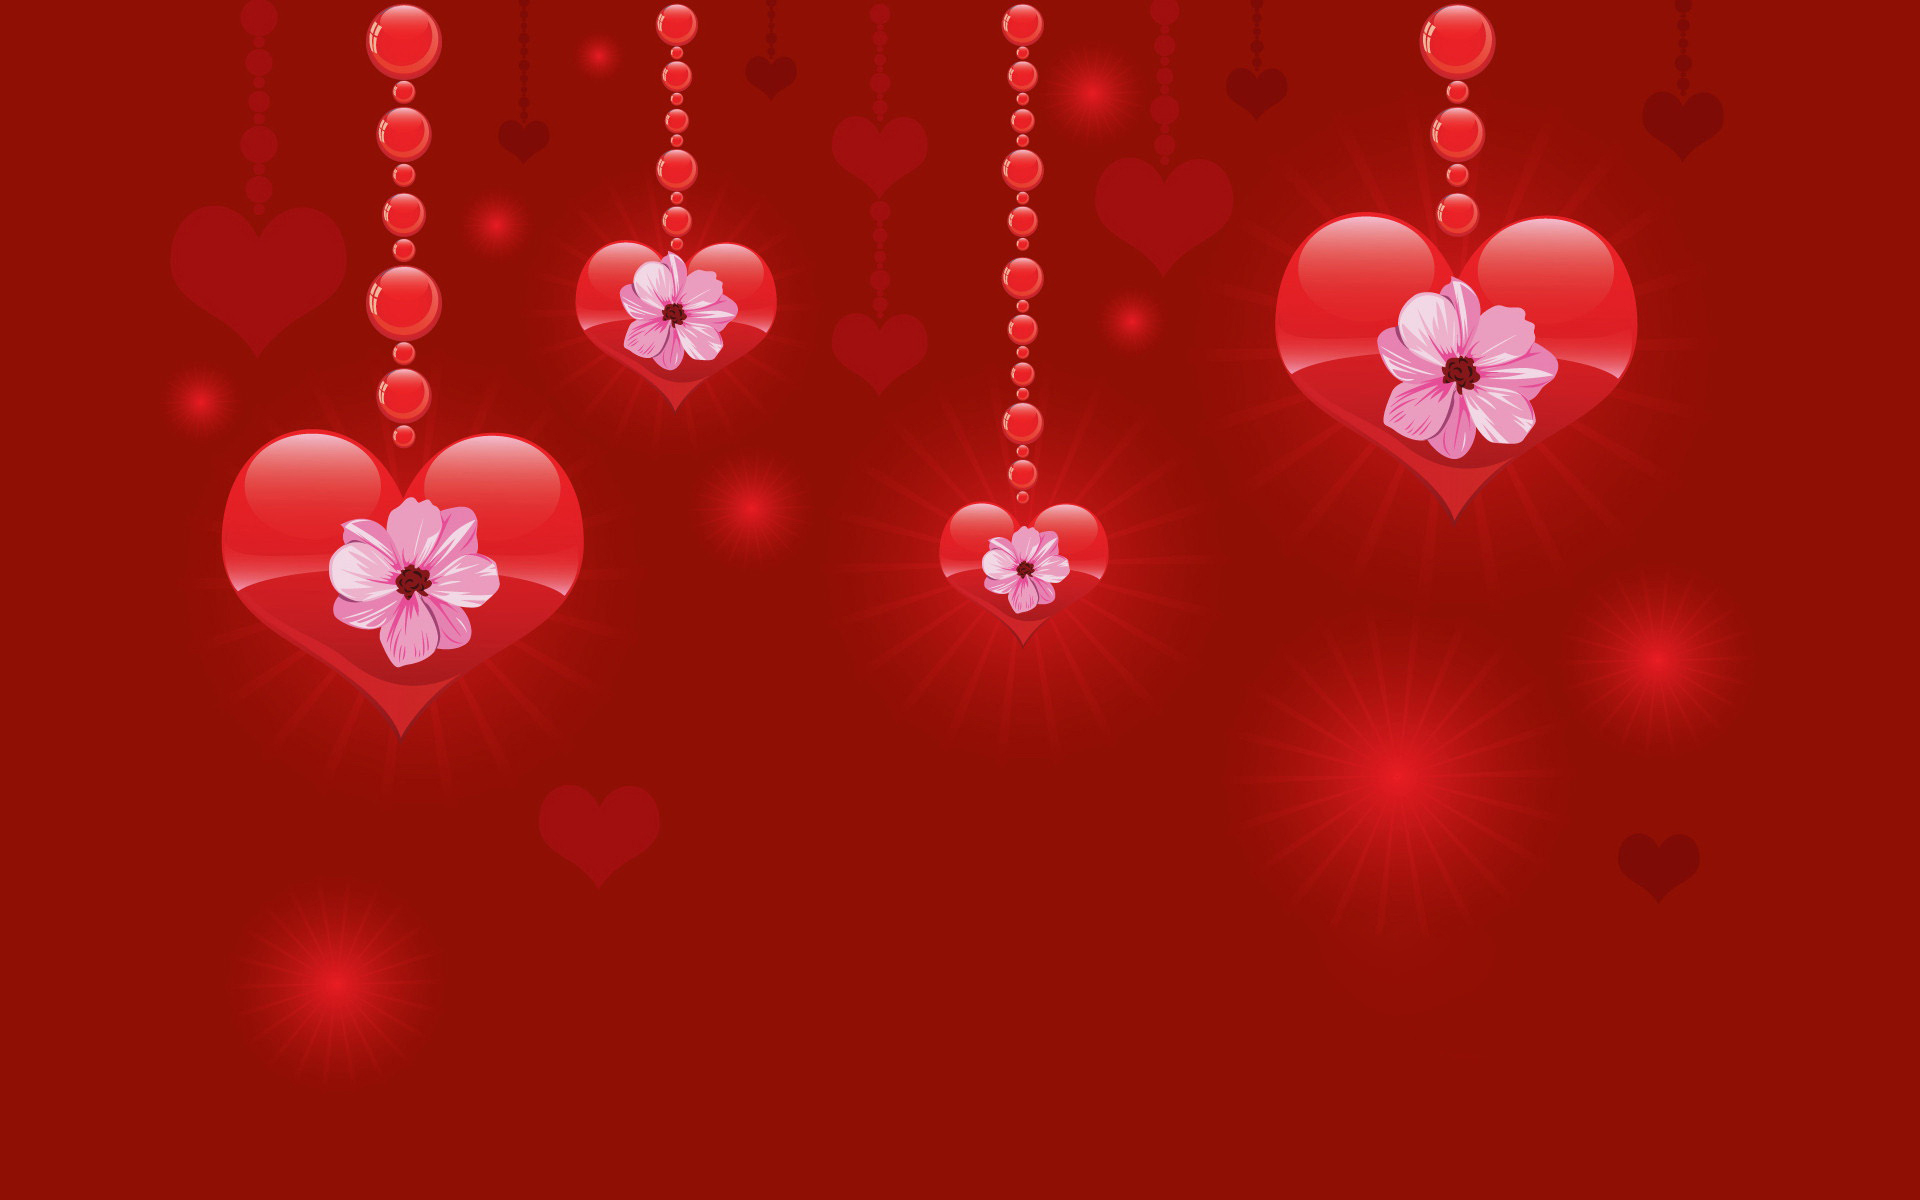 Happy Valentines Day Wallpaper Desktop 1920x1200